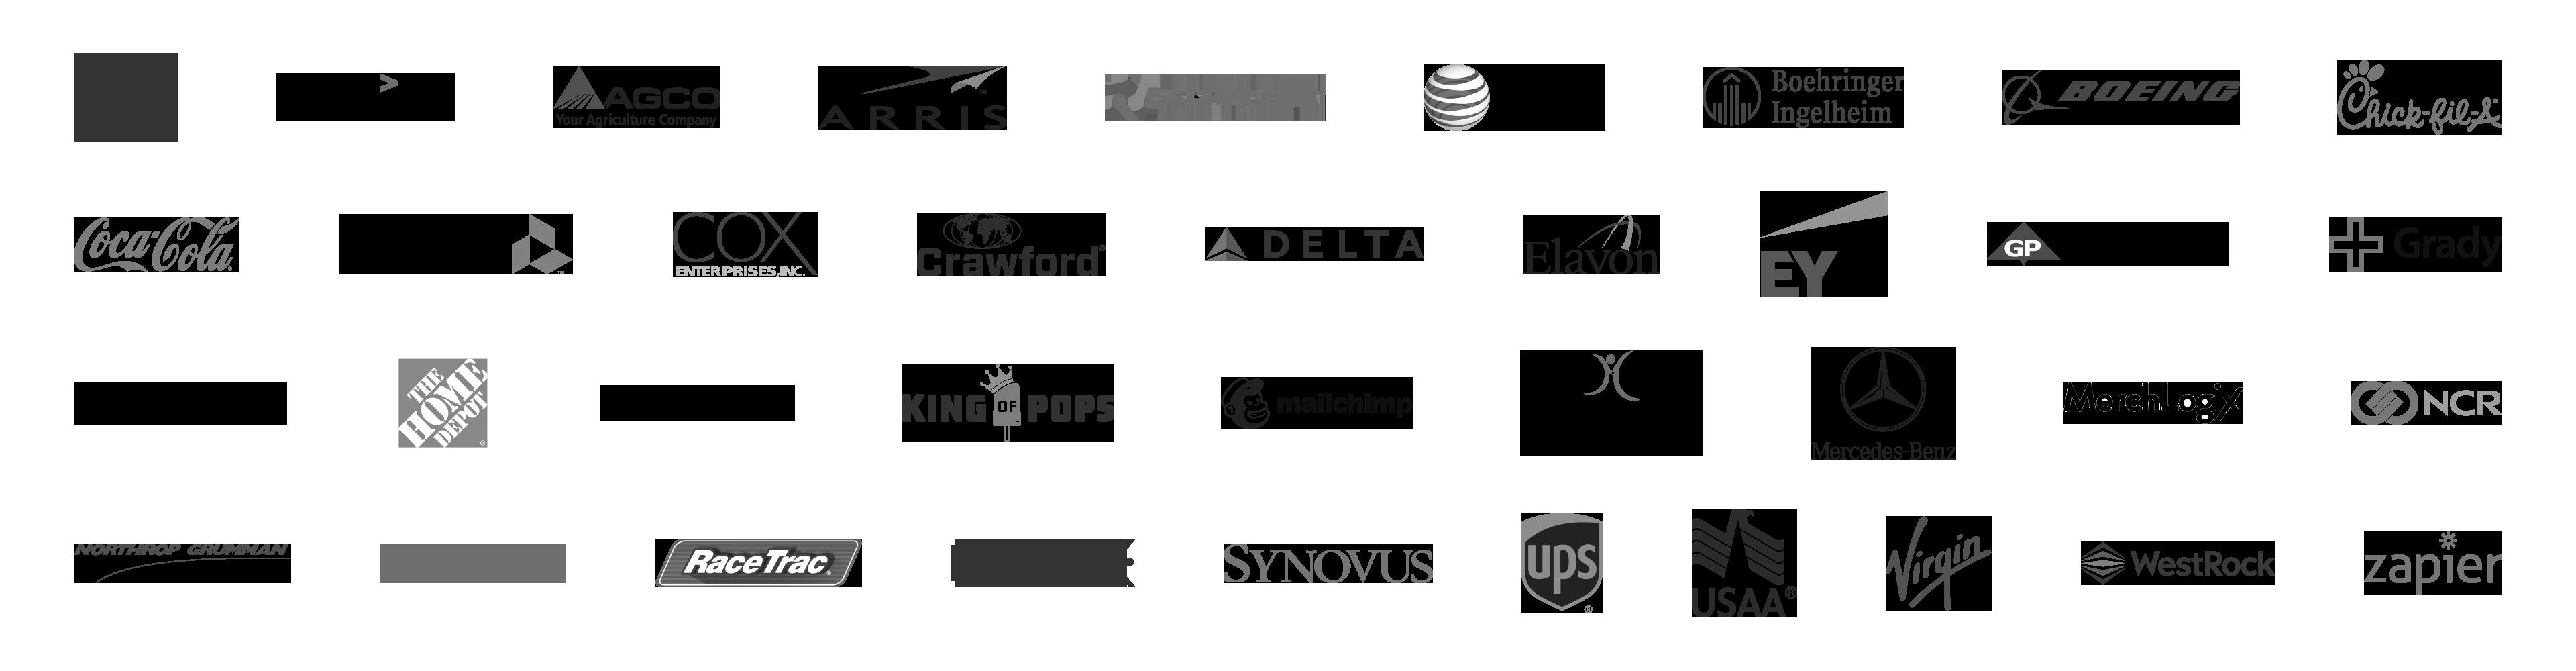 Atlanta Innovation Council